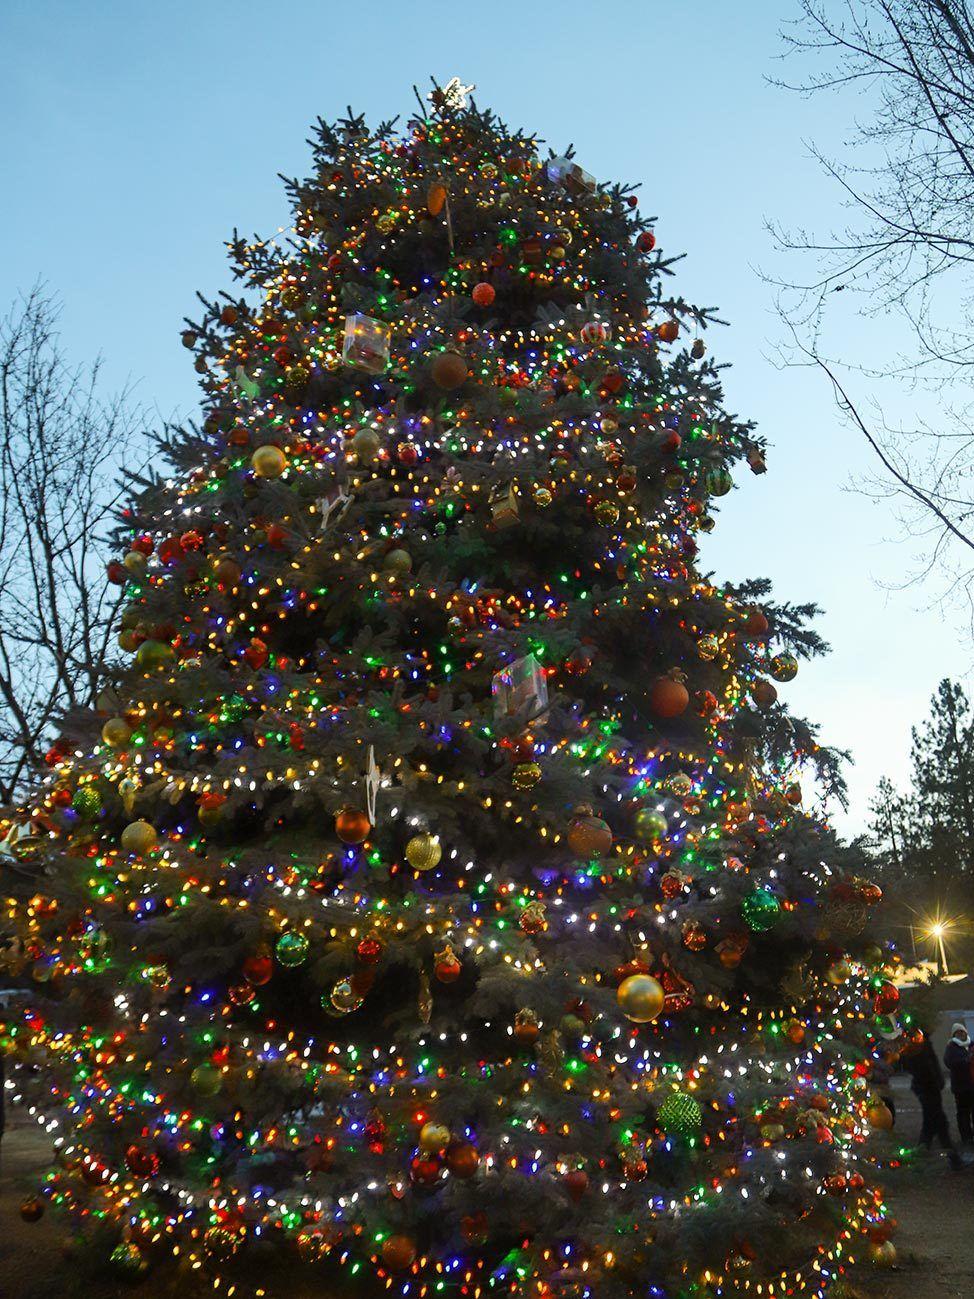 Christmas Tree in Big Bear Village, California